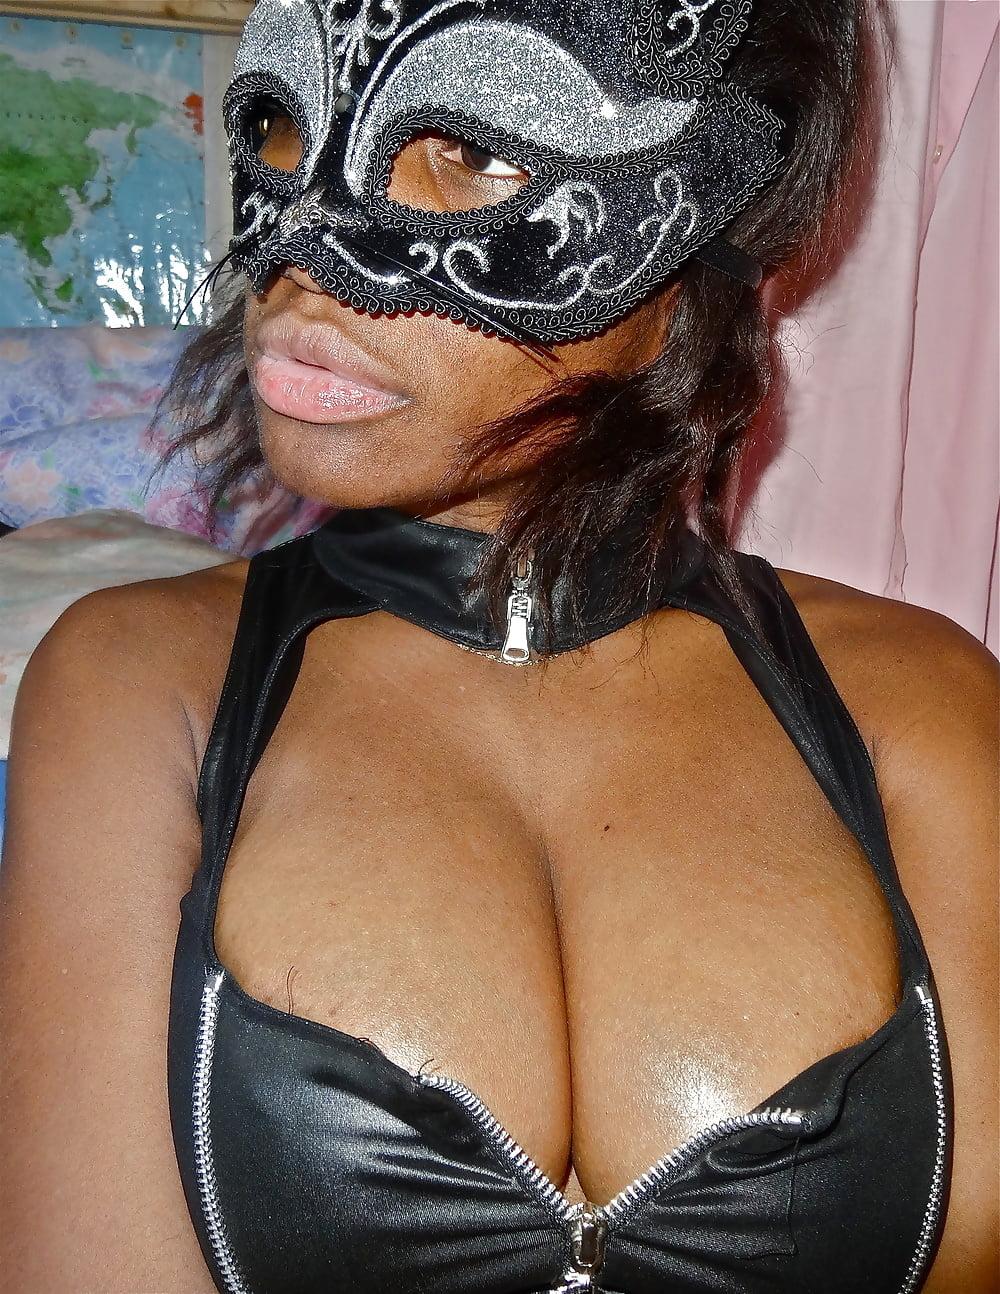 Jiggly black tits